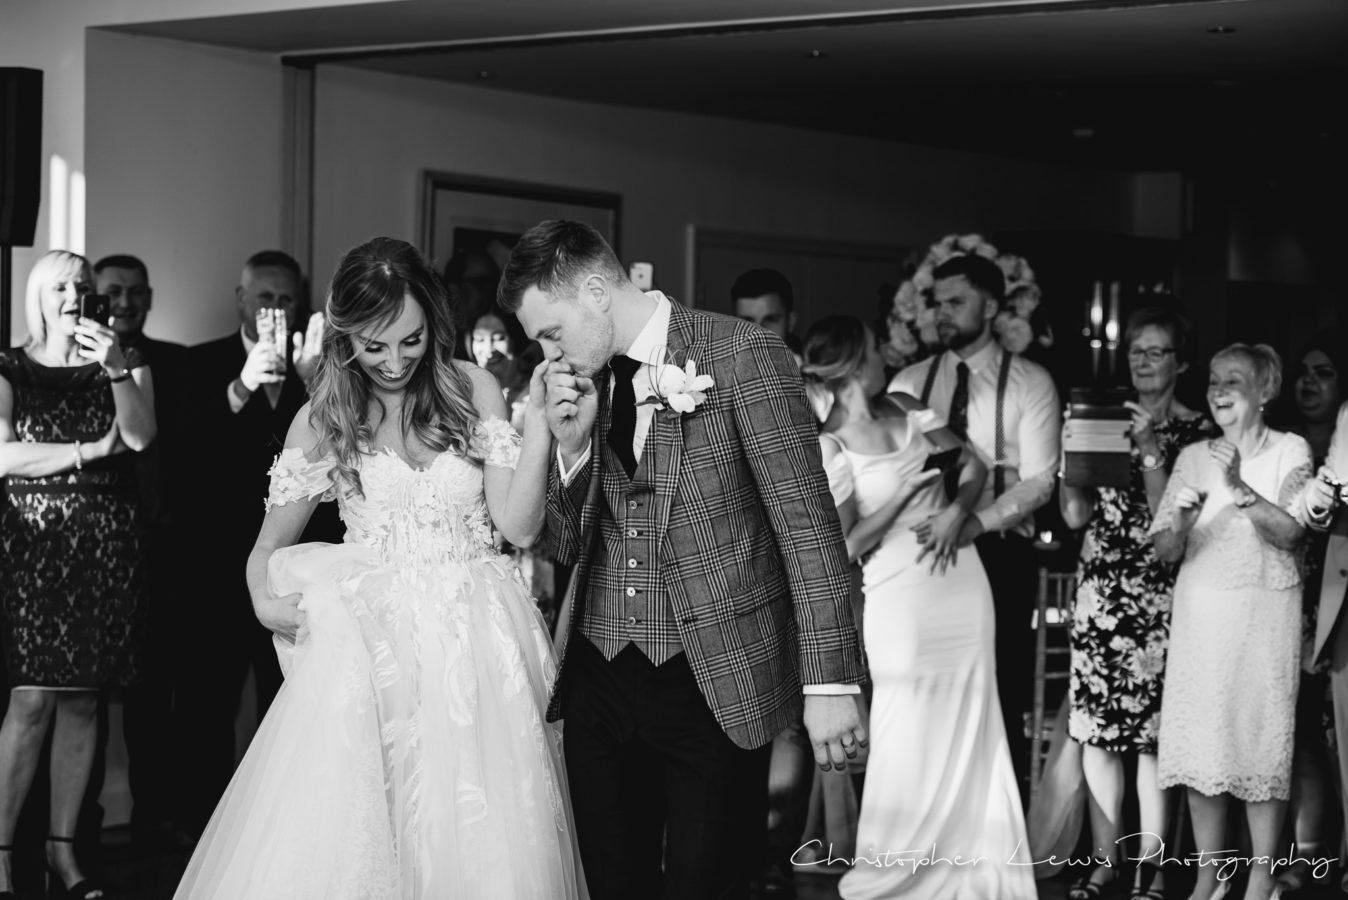 Mitton-Hall-Wedding 72